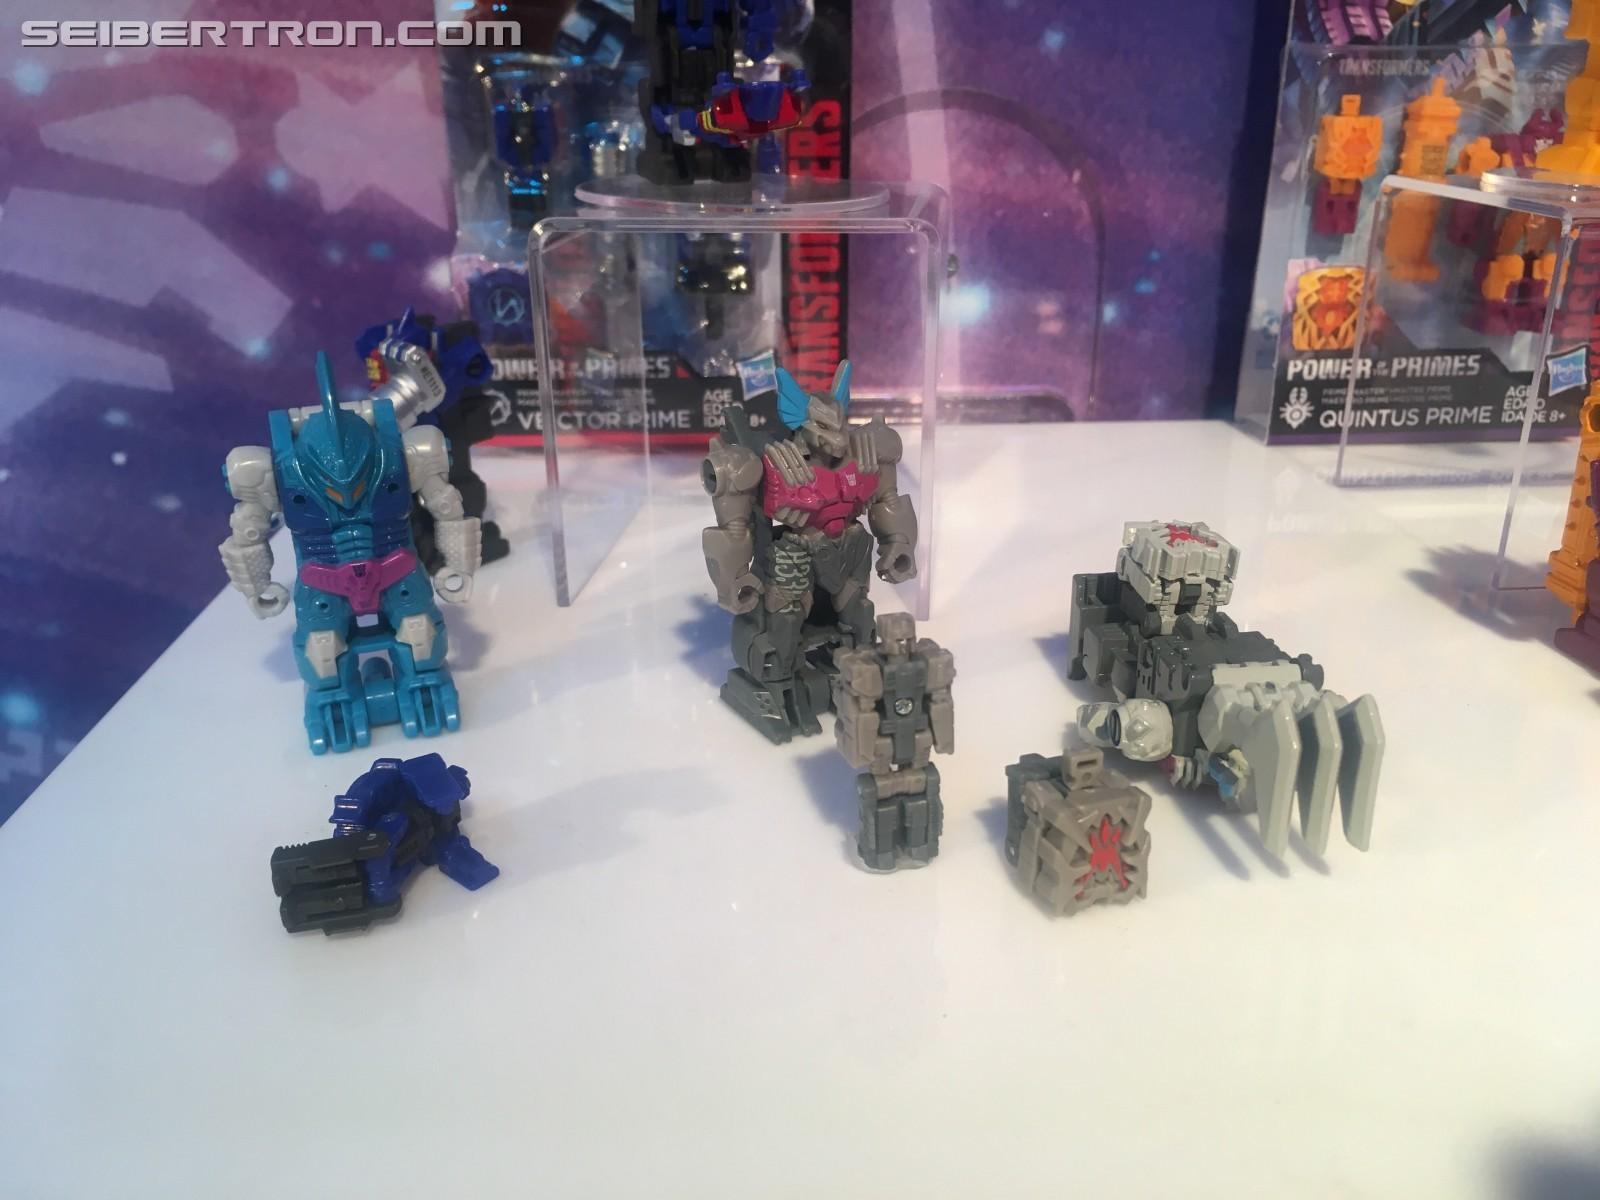 Transformers News: Toy Fair 2018 - Transformers Power of the Primes Nova Star, Prime Masters, More #HasbroToyFair #NYTF